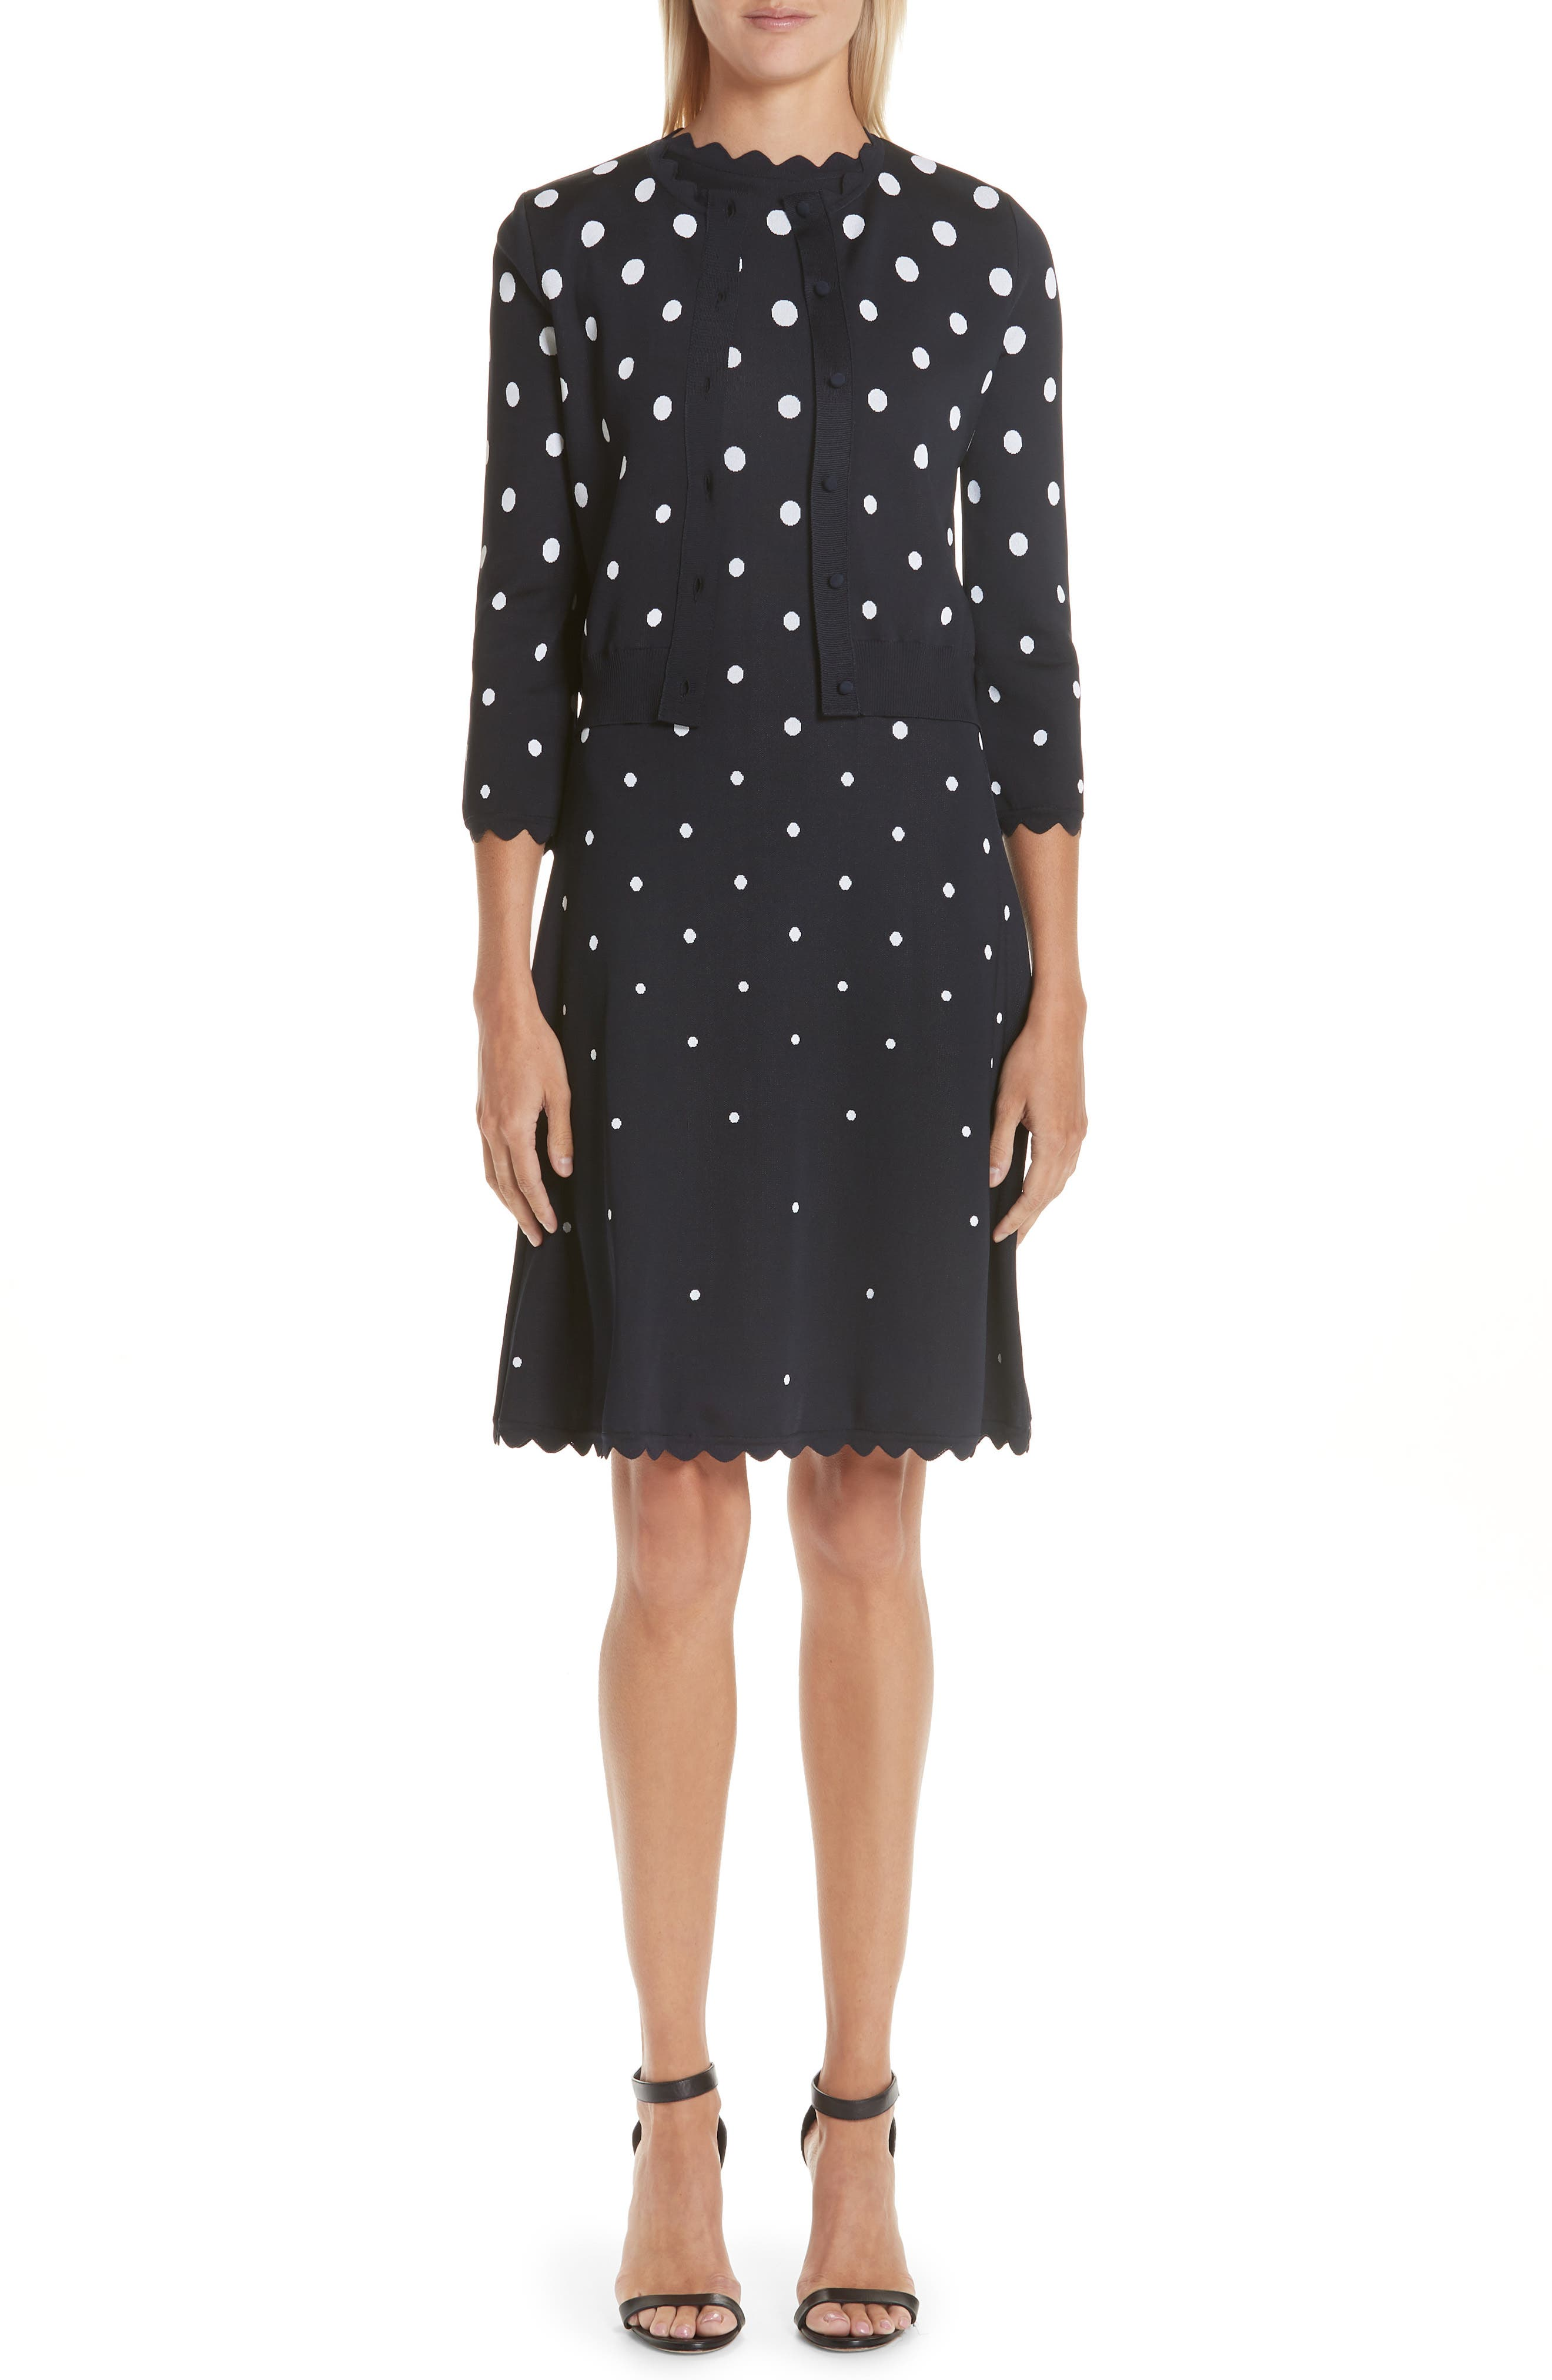 Scallop Edge Polka Dot A-Line Dress,                             Alternate thumbnail 8, color,                             NVW-NAVY/ WHITE